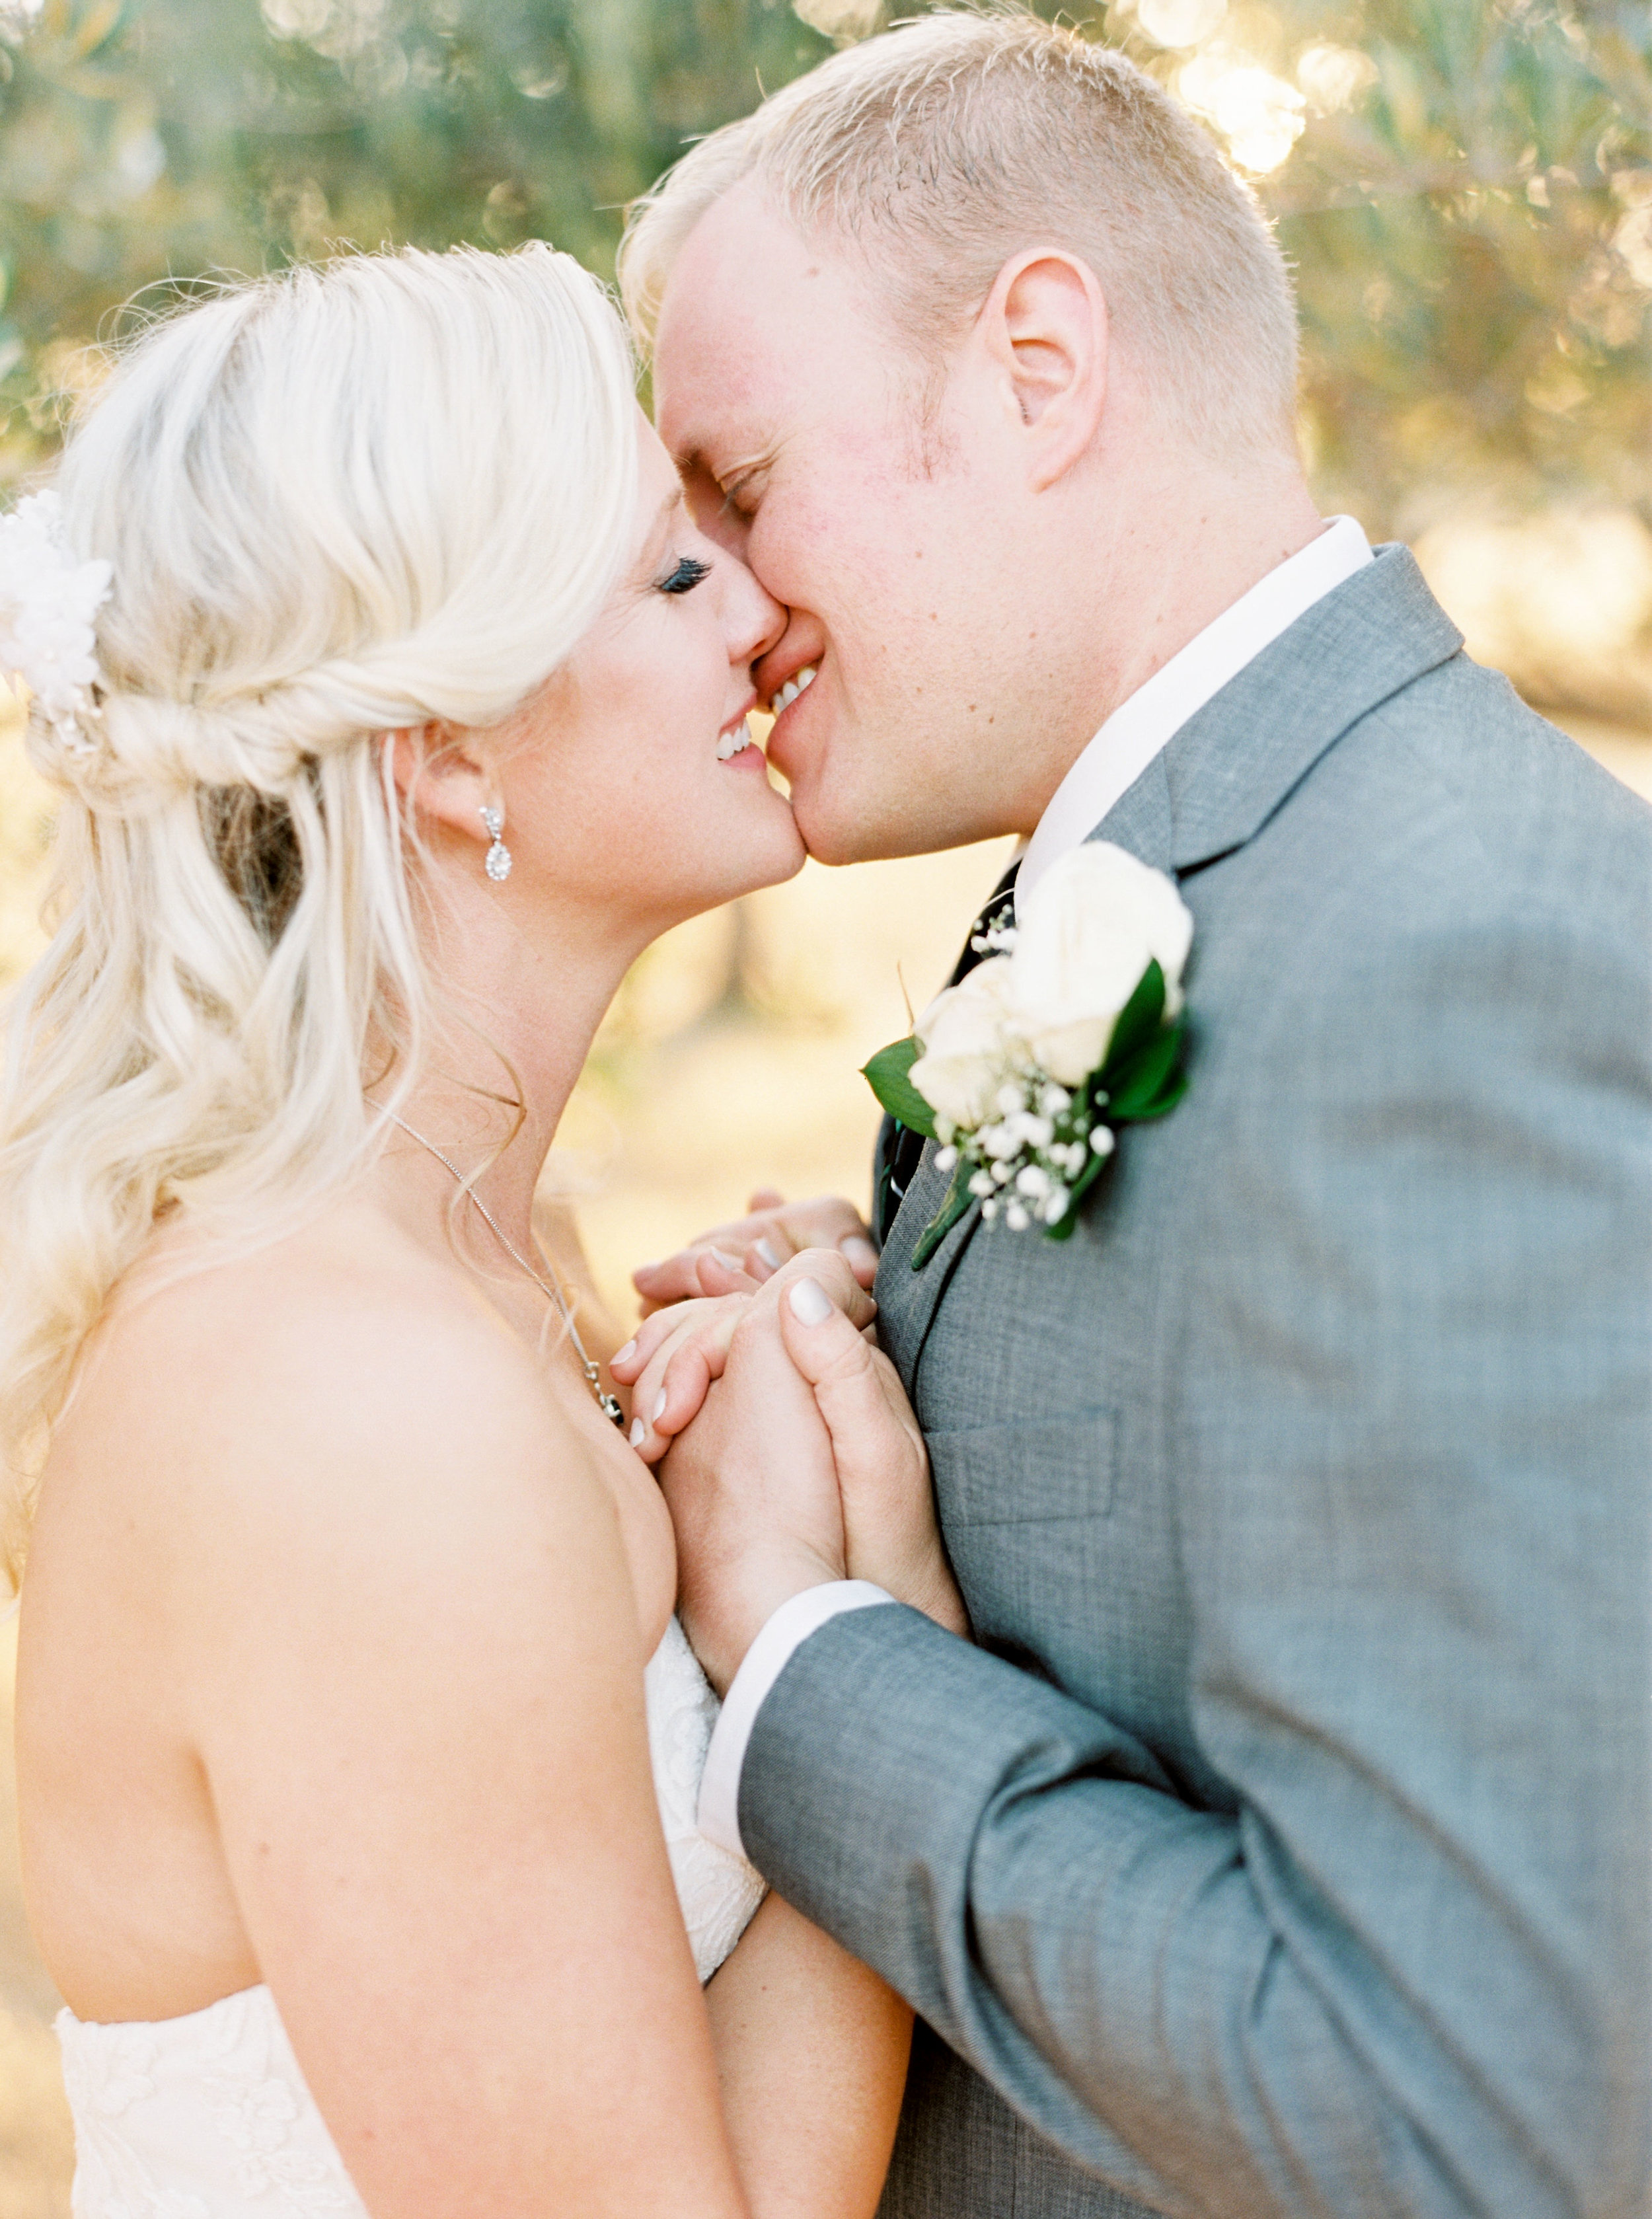 wolfe-heights-event-center-wedding-sacramento-california-wedding-41.jpg